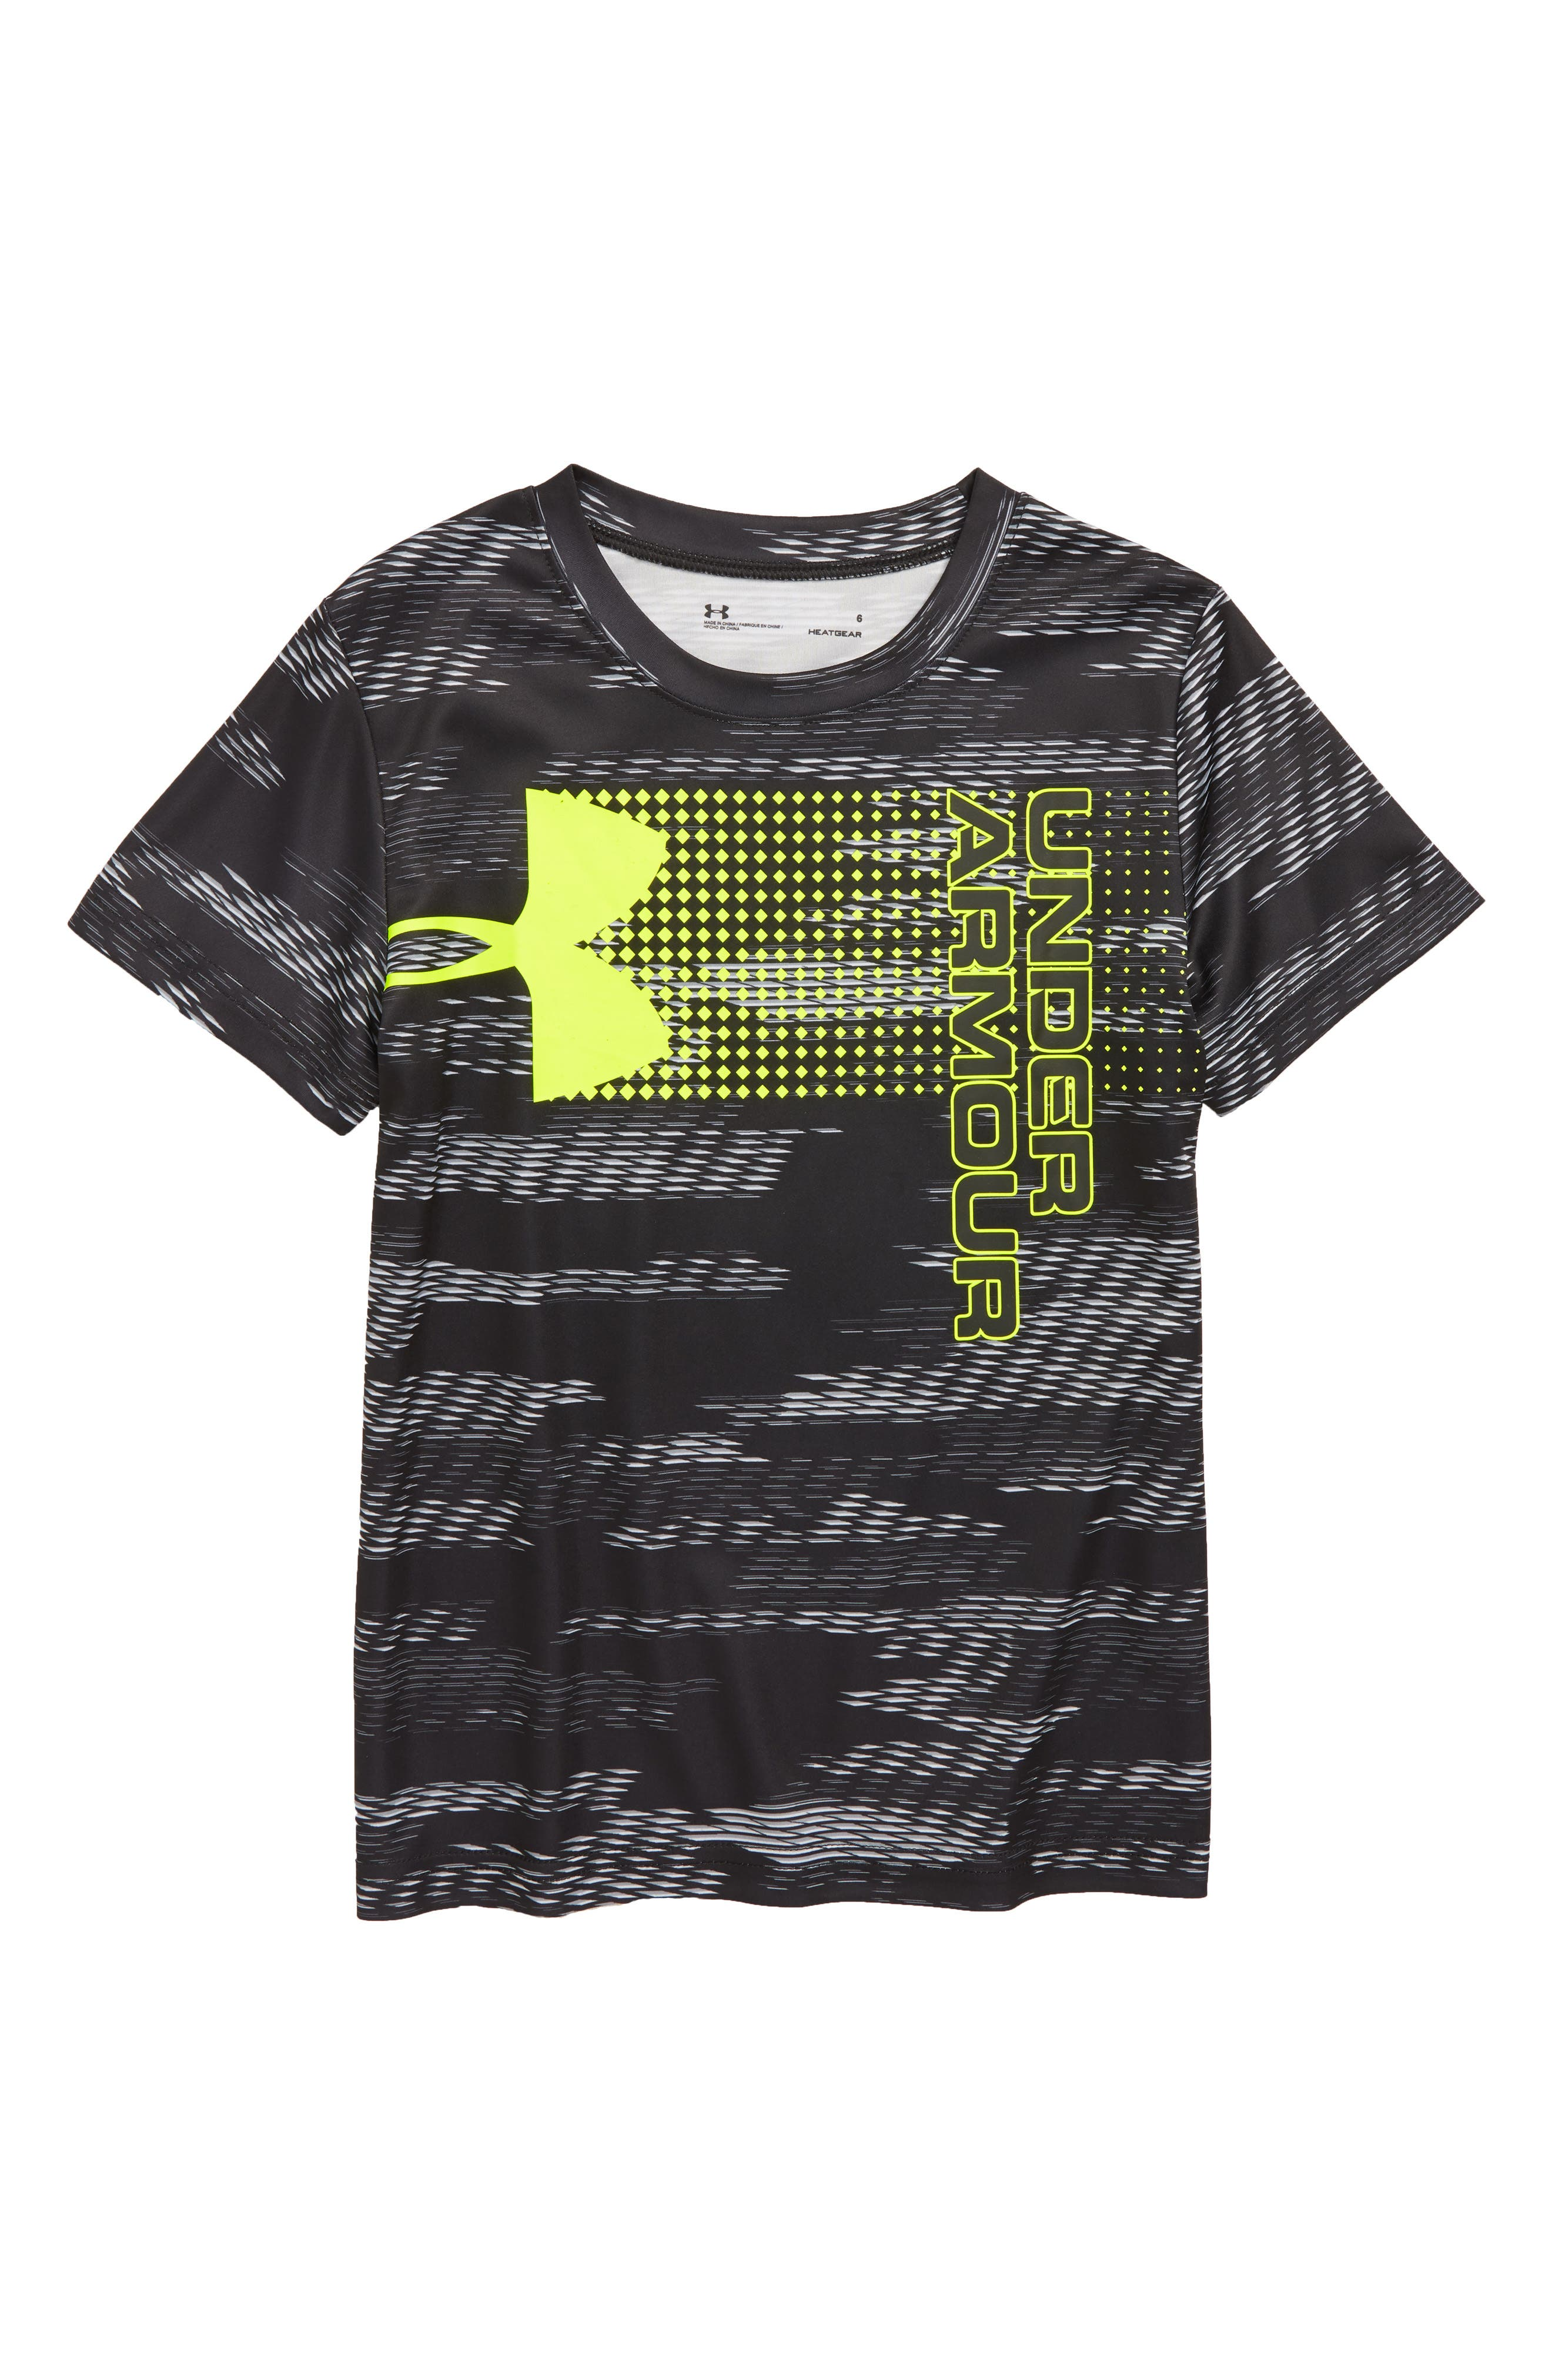 Trave Hybrid Shirt,                         Main,                         color, BLACK